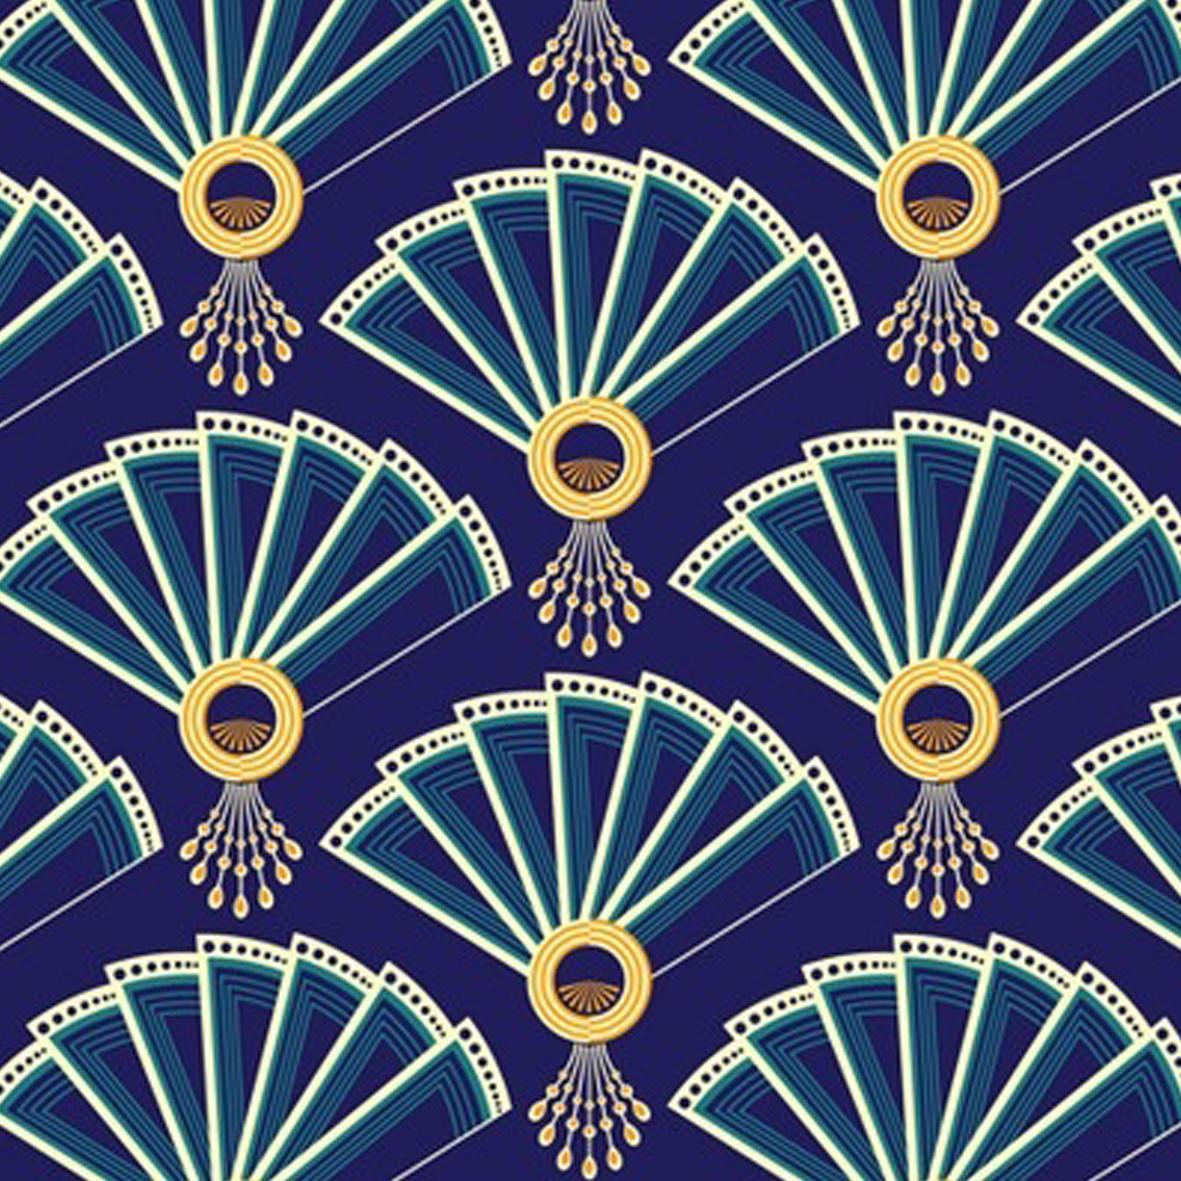 Art Deco Patterns: Iheartprintsandpatterns: The Great Gatsby